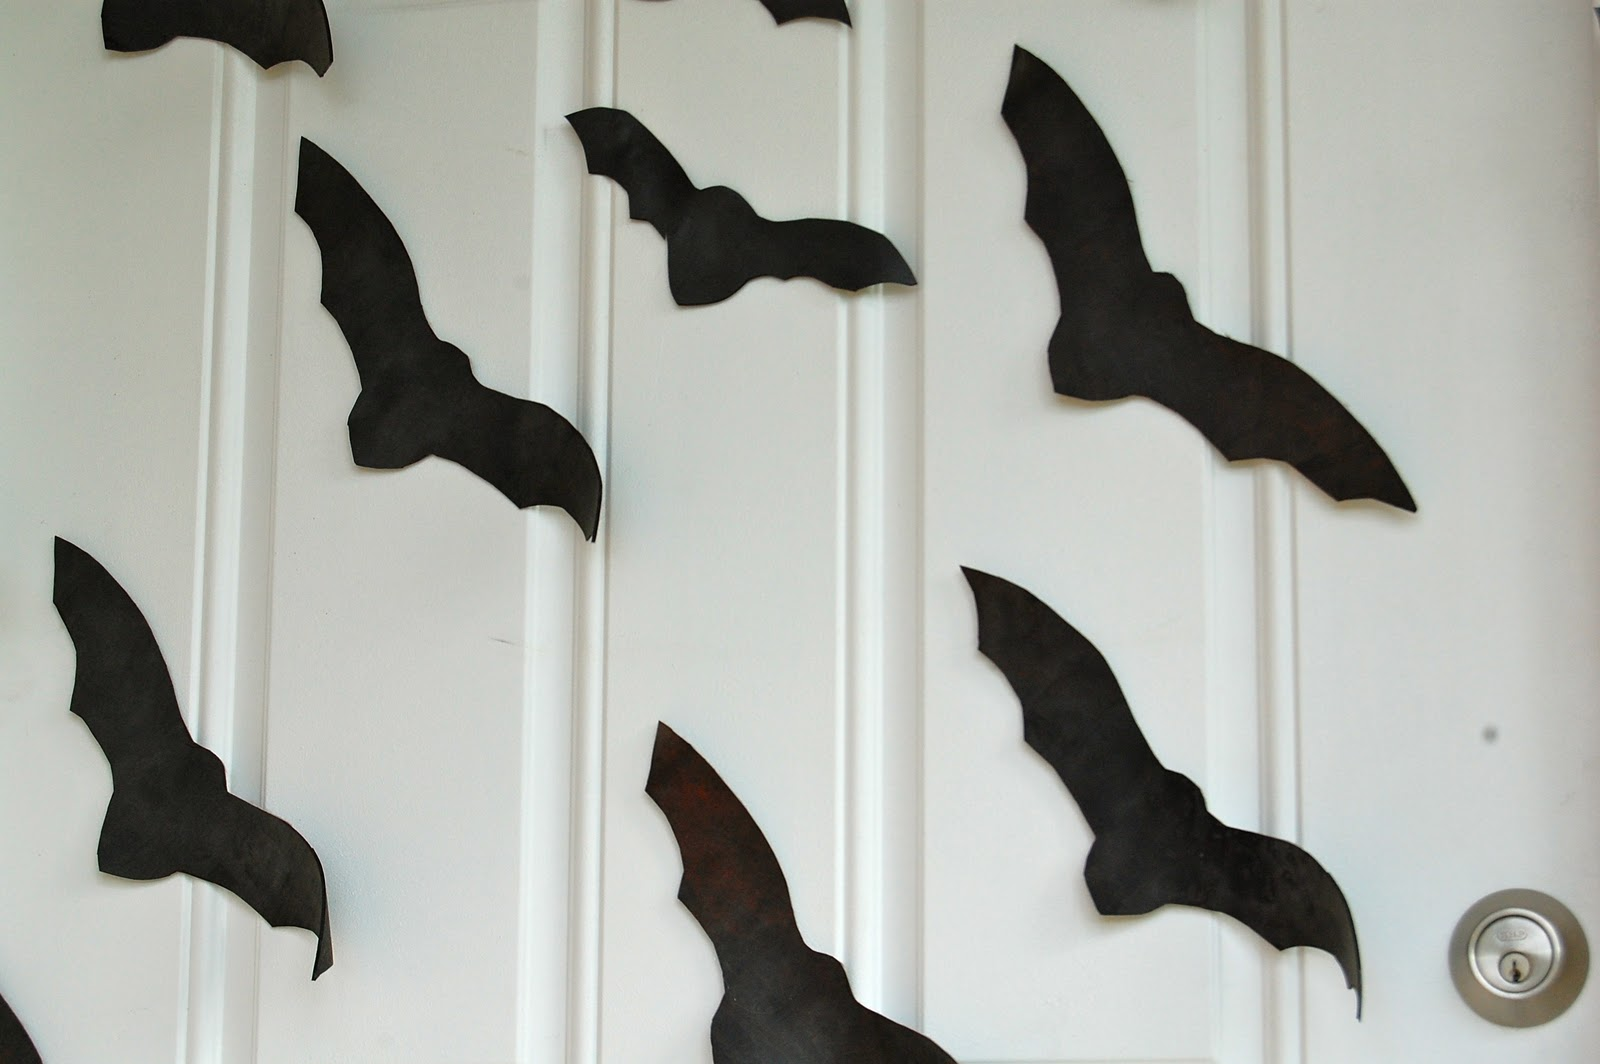 The Polka-Dot Umbrella: Halloween Decorations